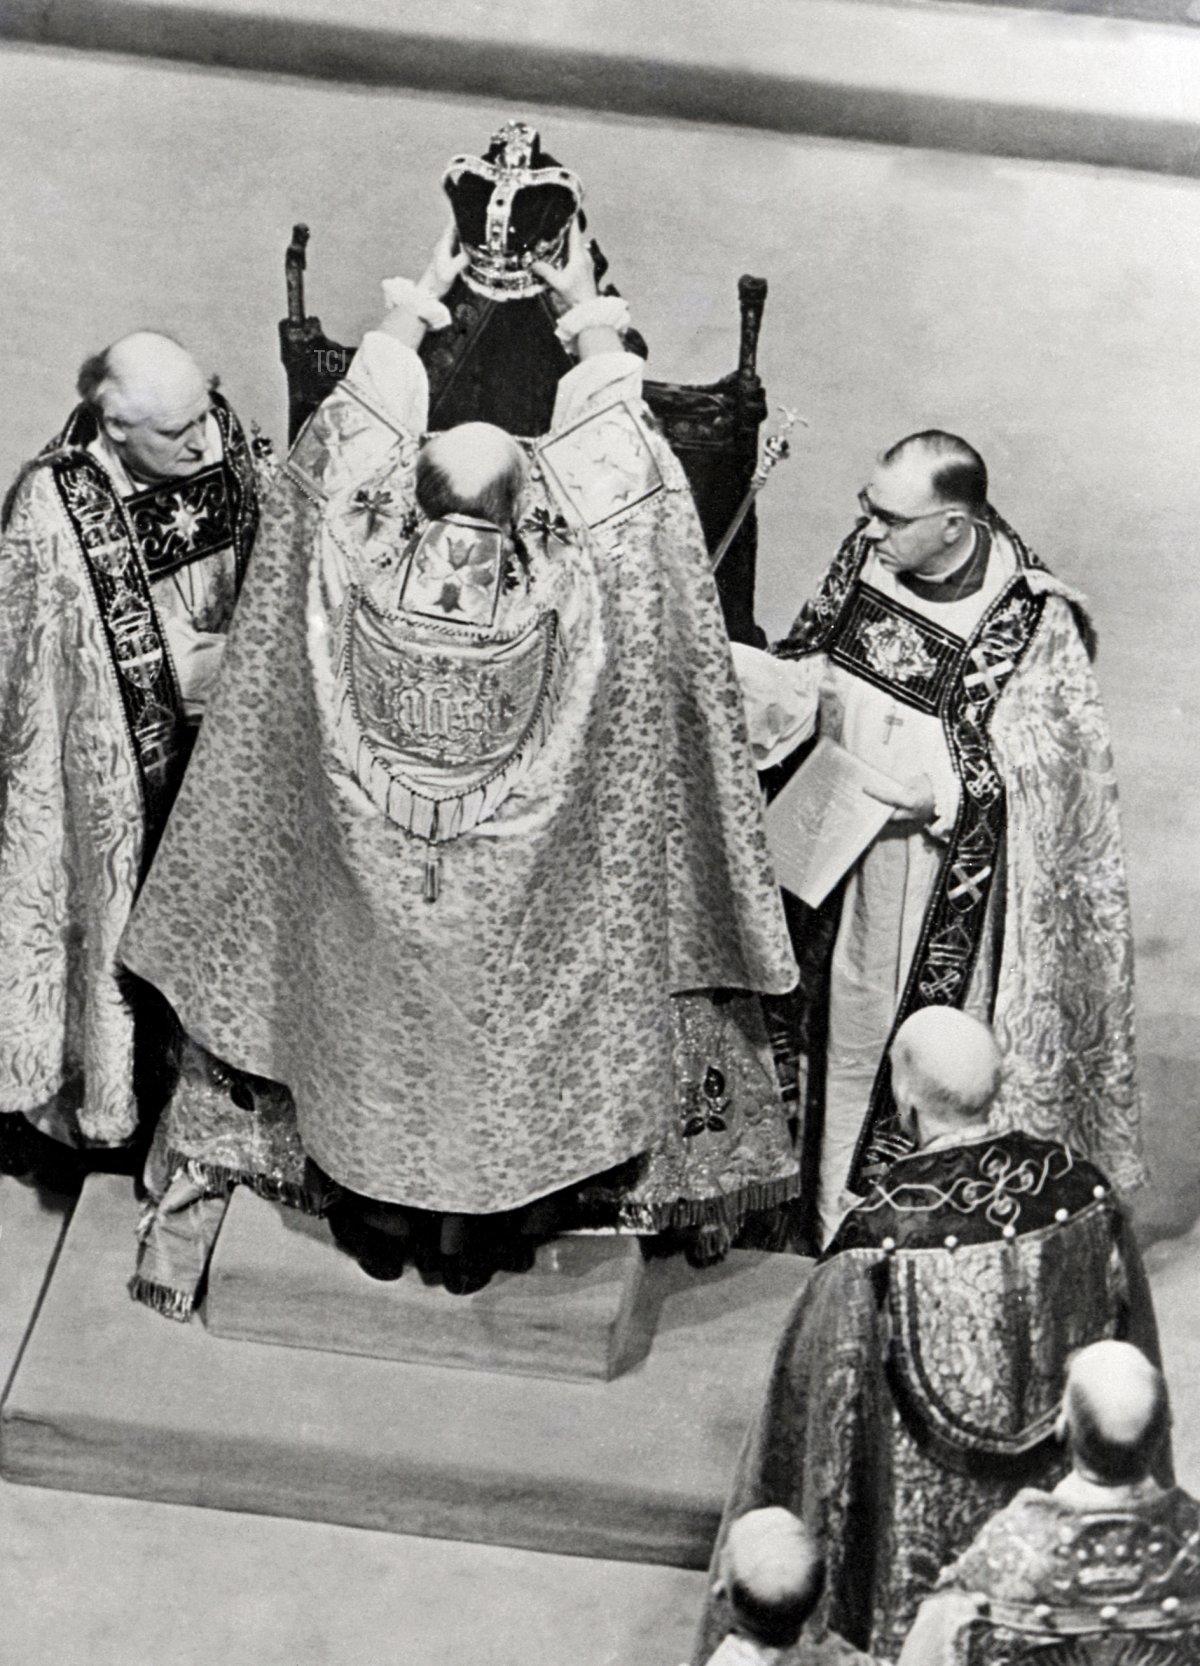 A picture of the coronation of the Queen Elizabeth II, taken 02 June 1953 in Westminster Abbey, London